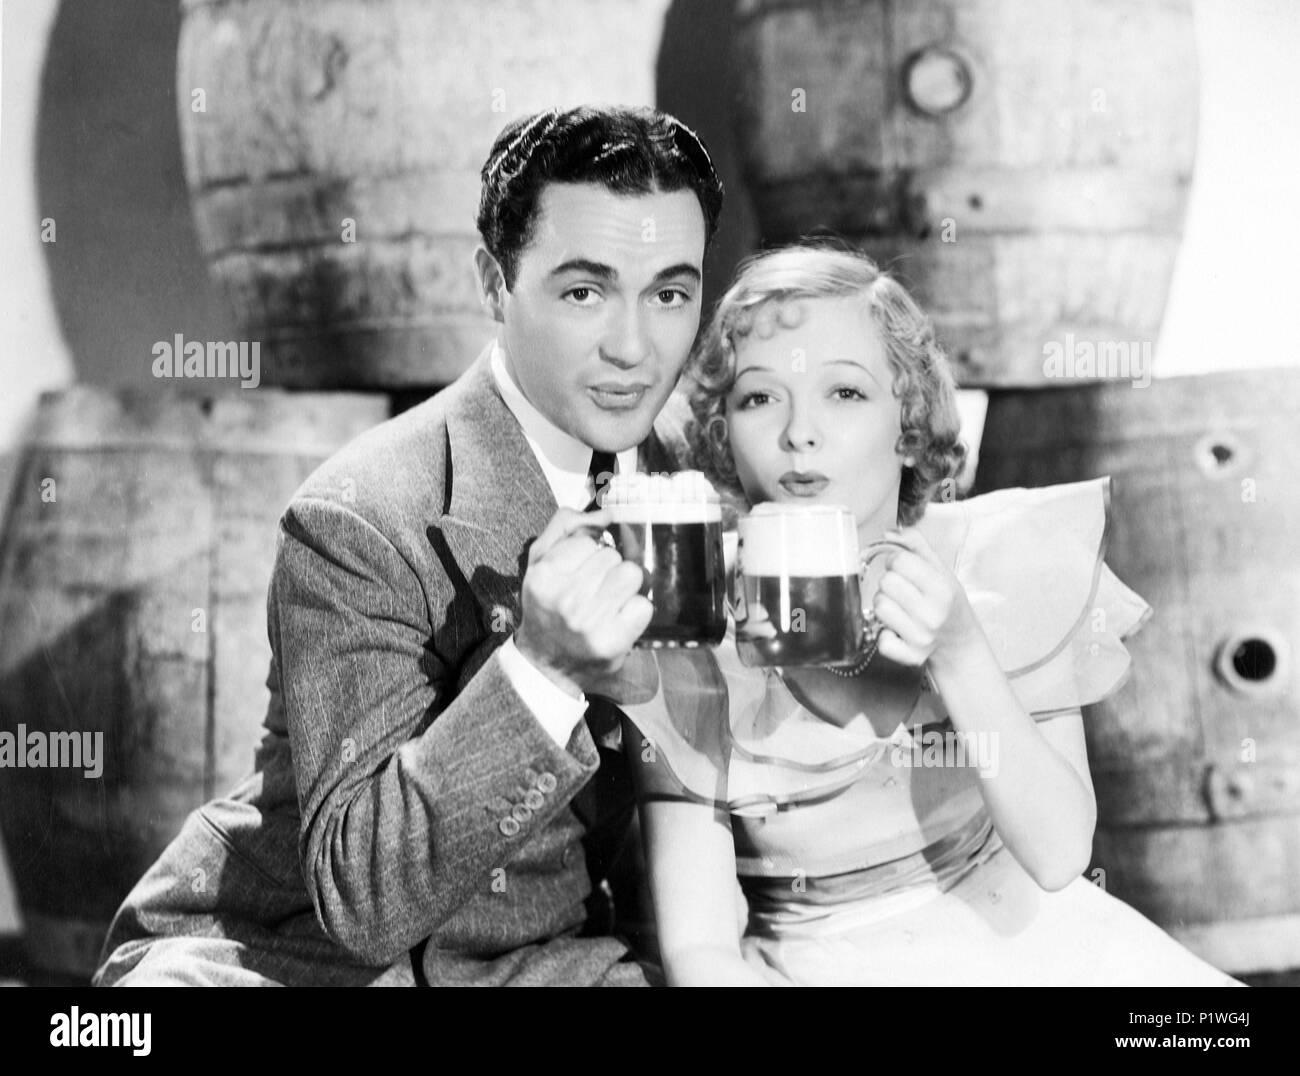 Original Film Title: BEST OF ENEMIES.  English Title: BEST OF ENEMIES.  Film Director: RIAN JAMES.  Year: 1933.  Stars: MARIAN NIXON; CHARLES 'BUDDY' ROGERS. Credit: FOX FILM CORPORATION / Album - Stock Image